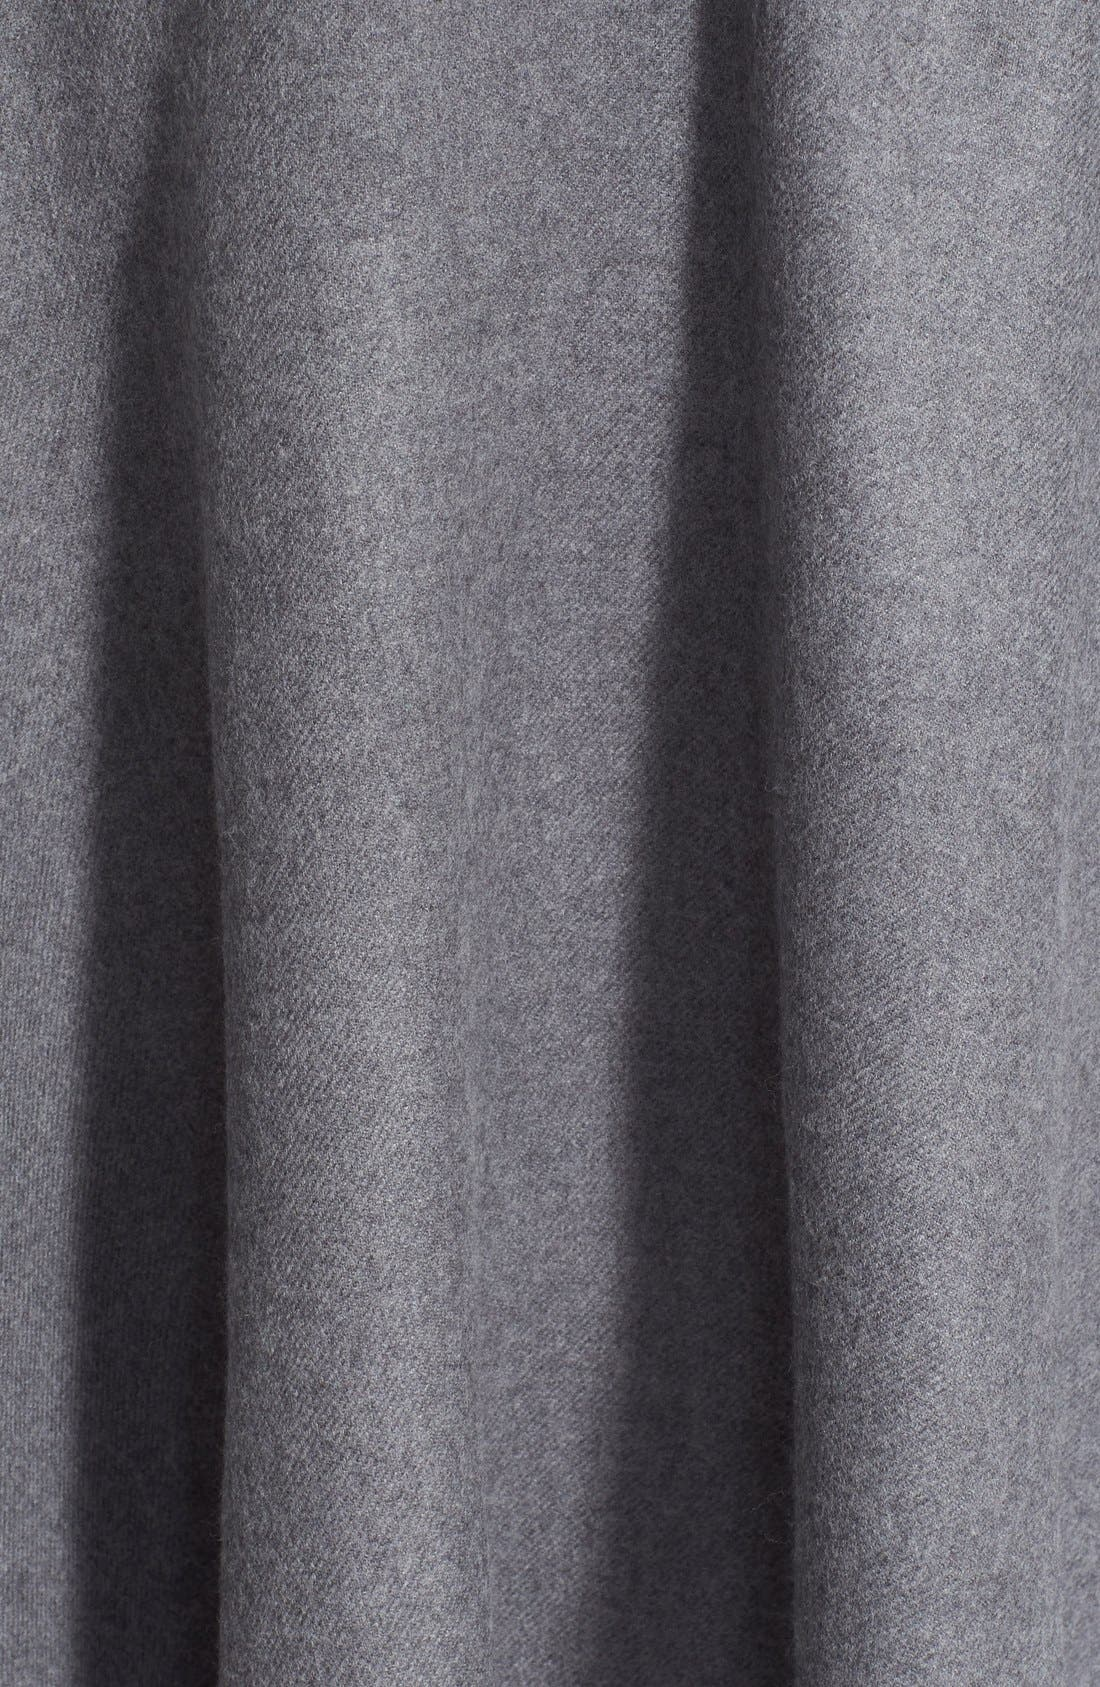 BURBERRY, Reversible Merino Wool Cape, Alternate thumbnail 3, color, 020